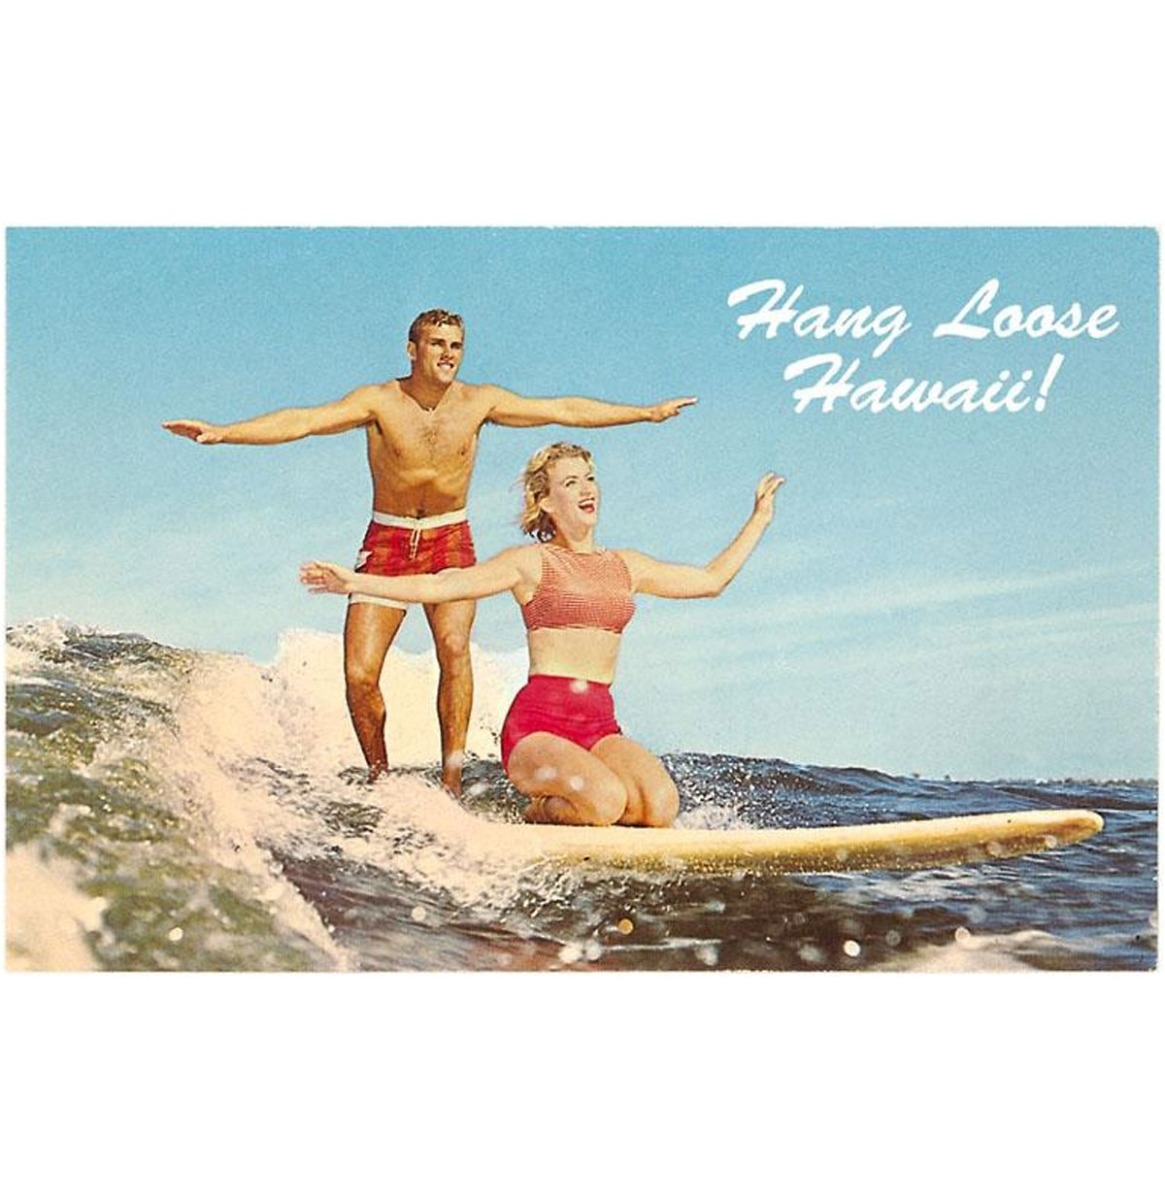 Hang Loose Hawaii, Tandem Surfing - Vintage Foto, Kunst Afdruk